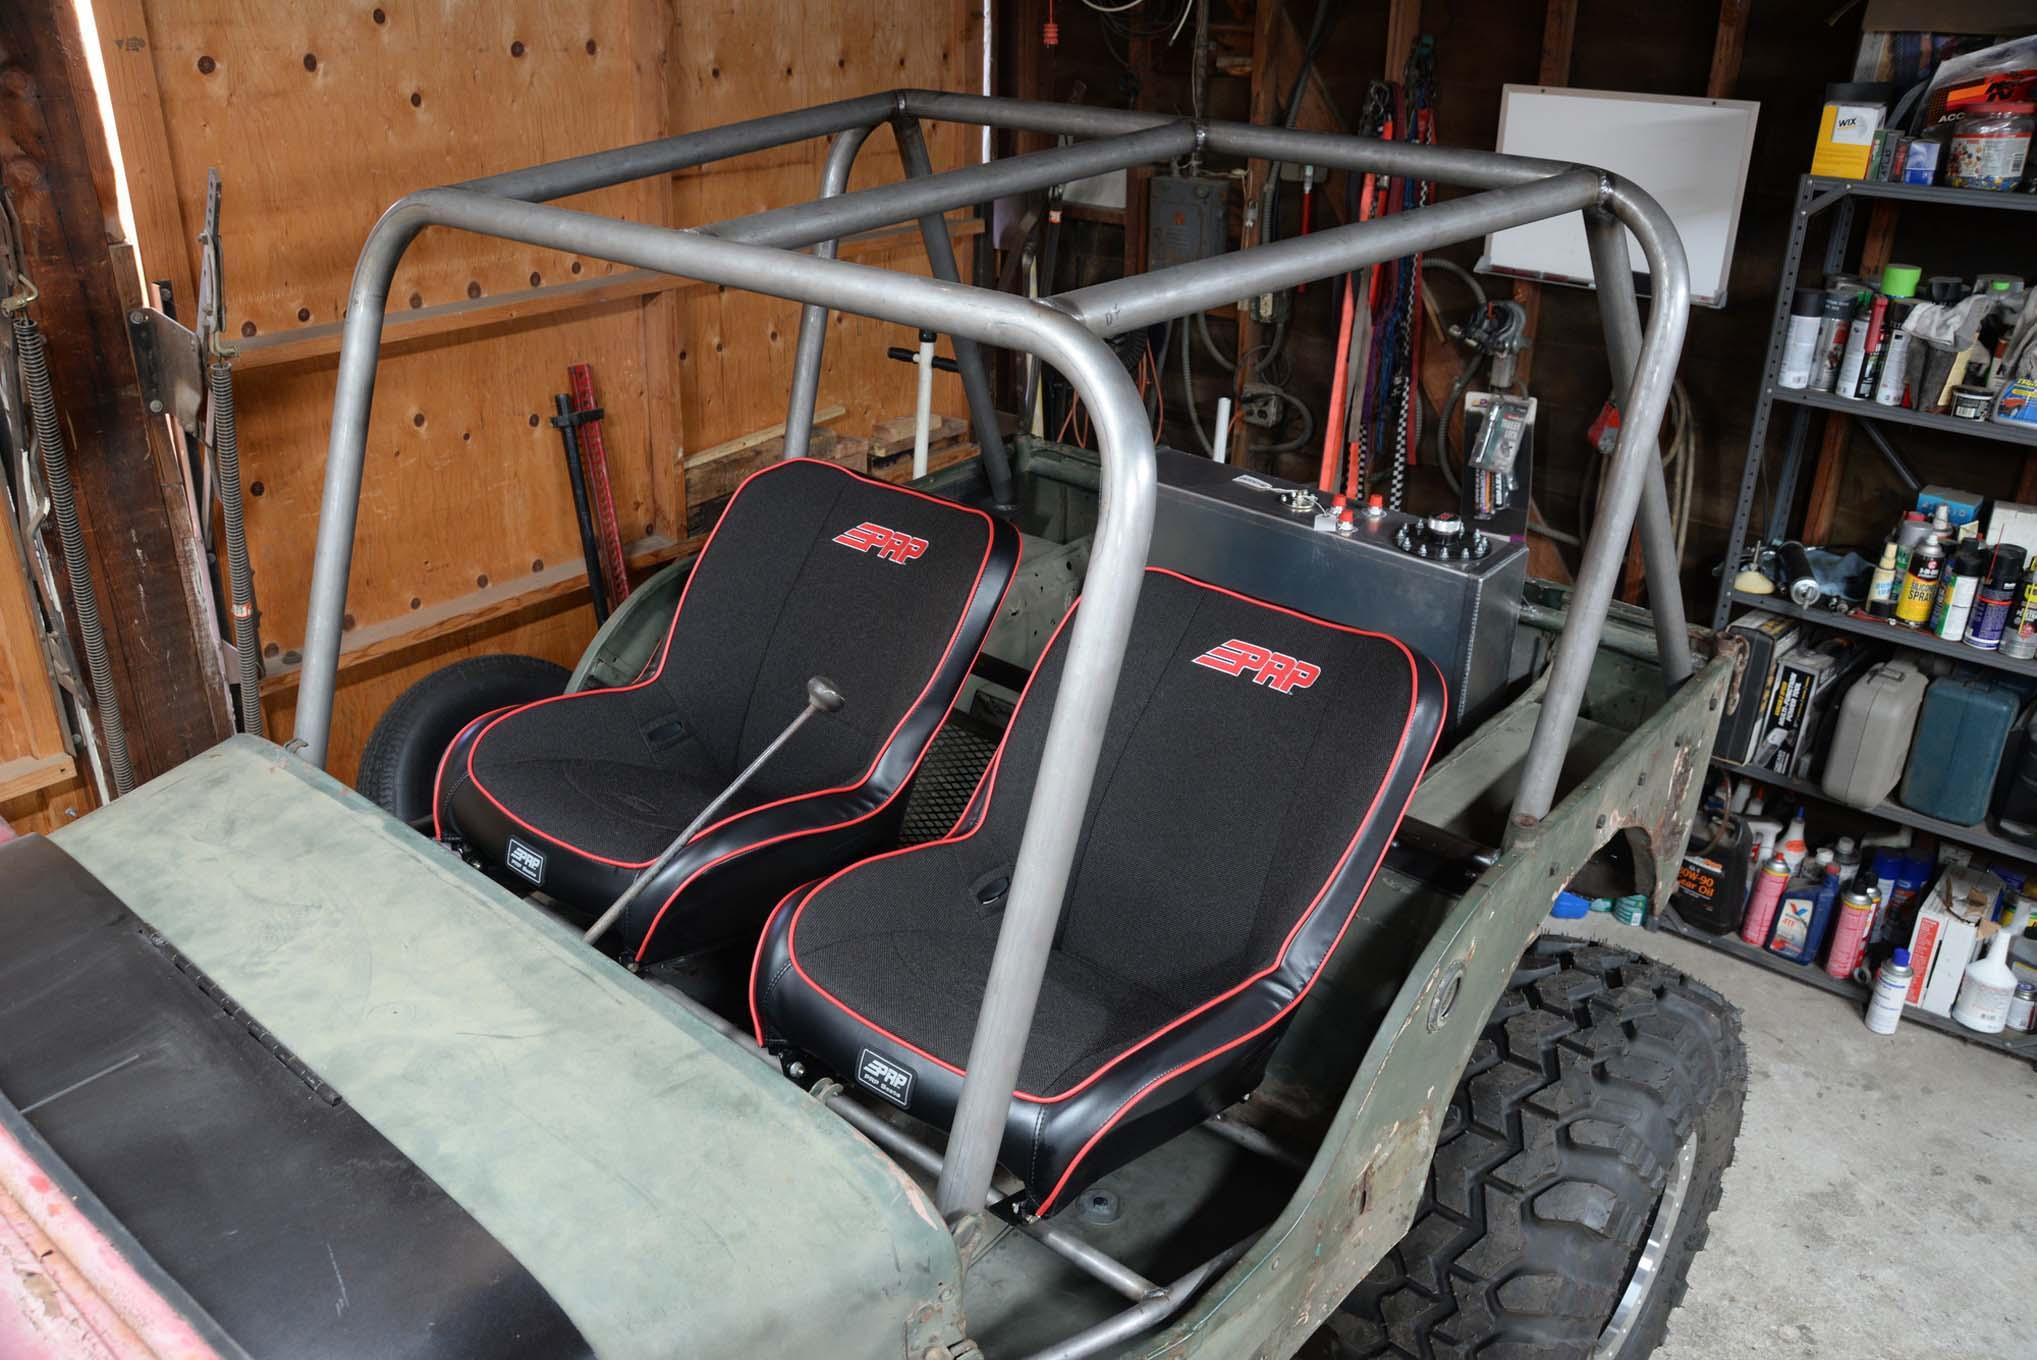 001 gpw jeep flatfender flattie rollcage dom weld welding cage fabrication prp seats cappa lpr